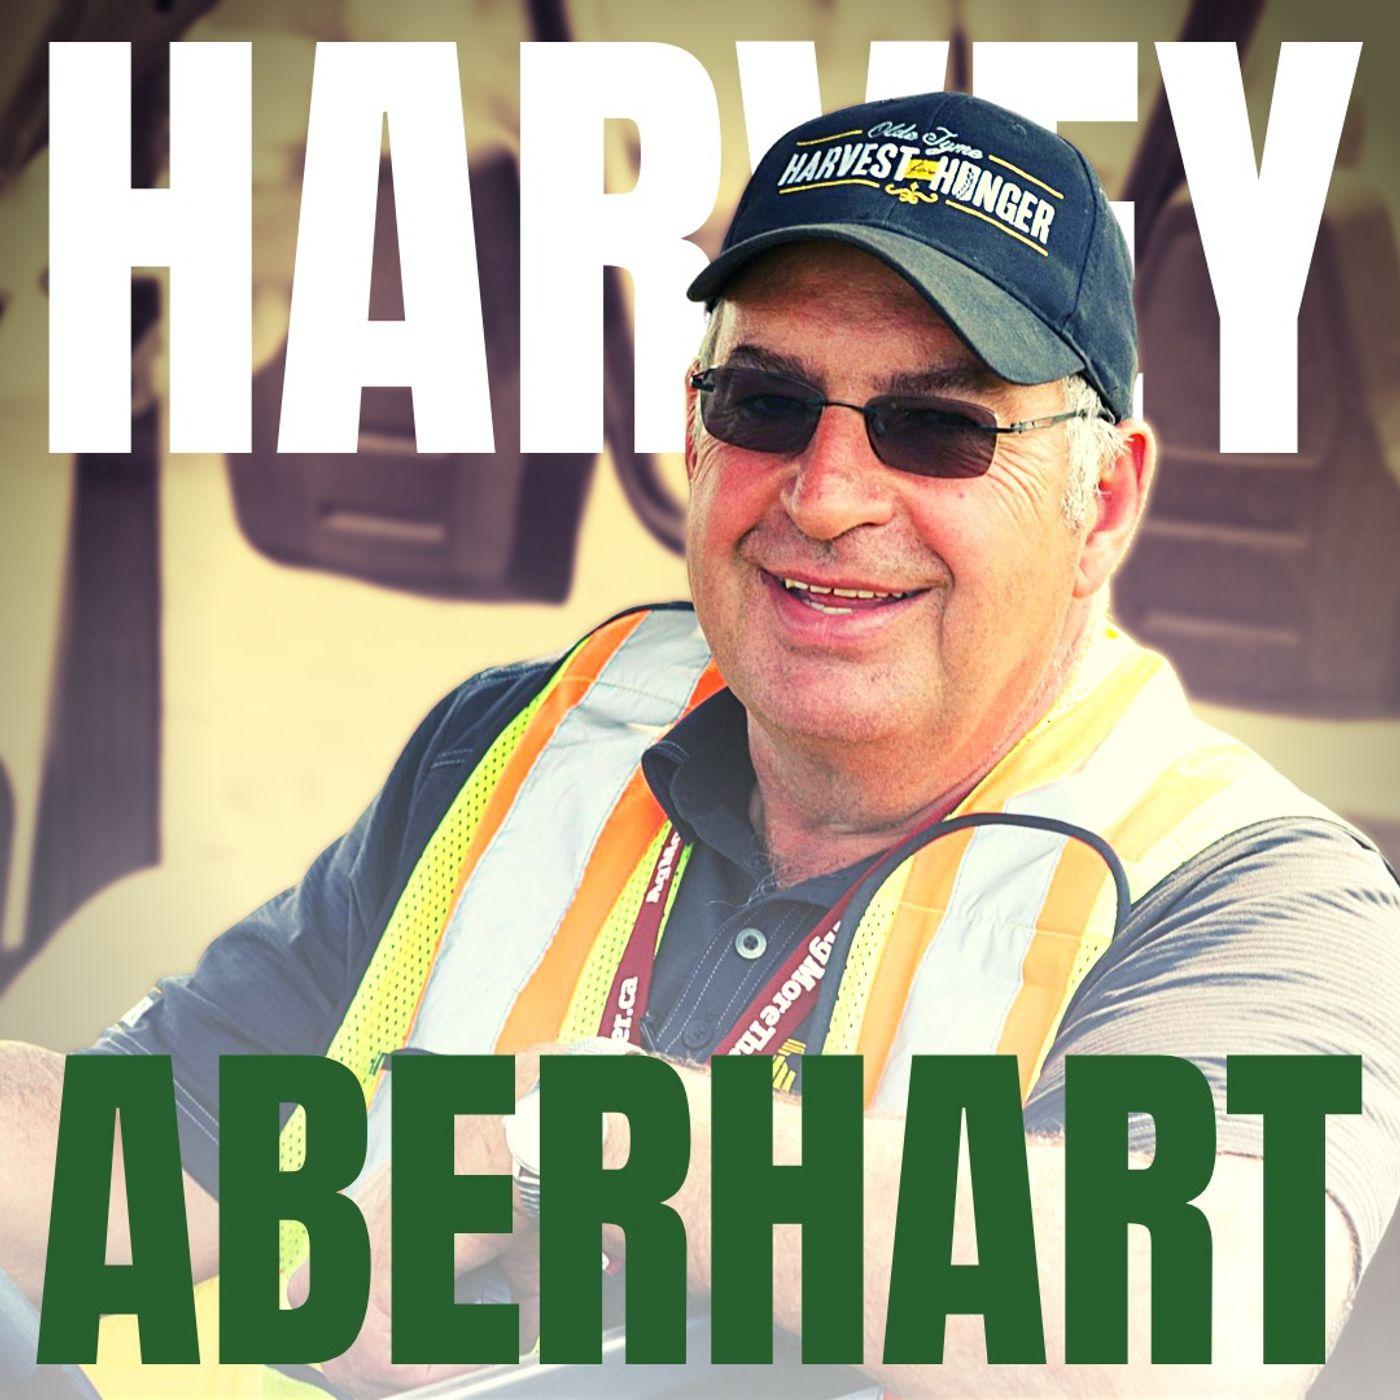 The Family Farm Business (Part I) with Harvey Aberhart